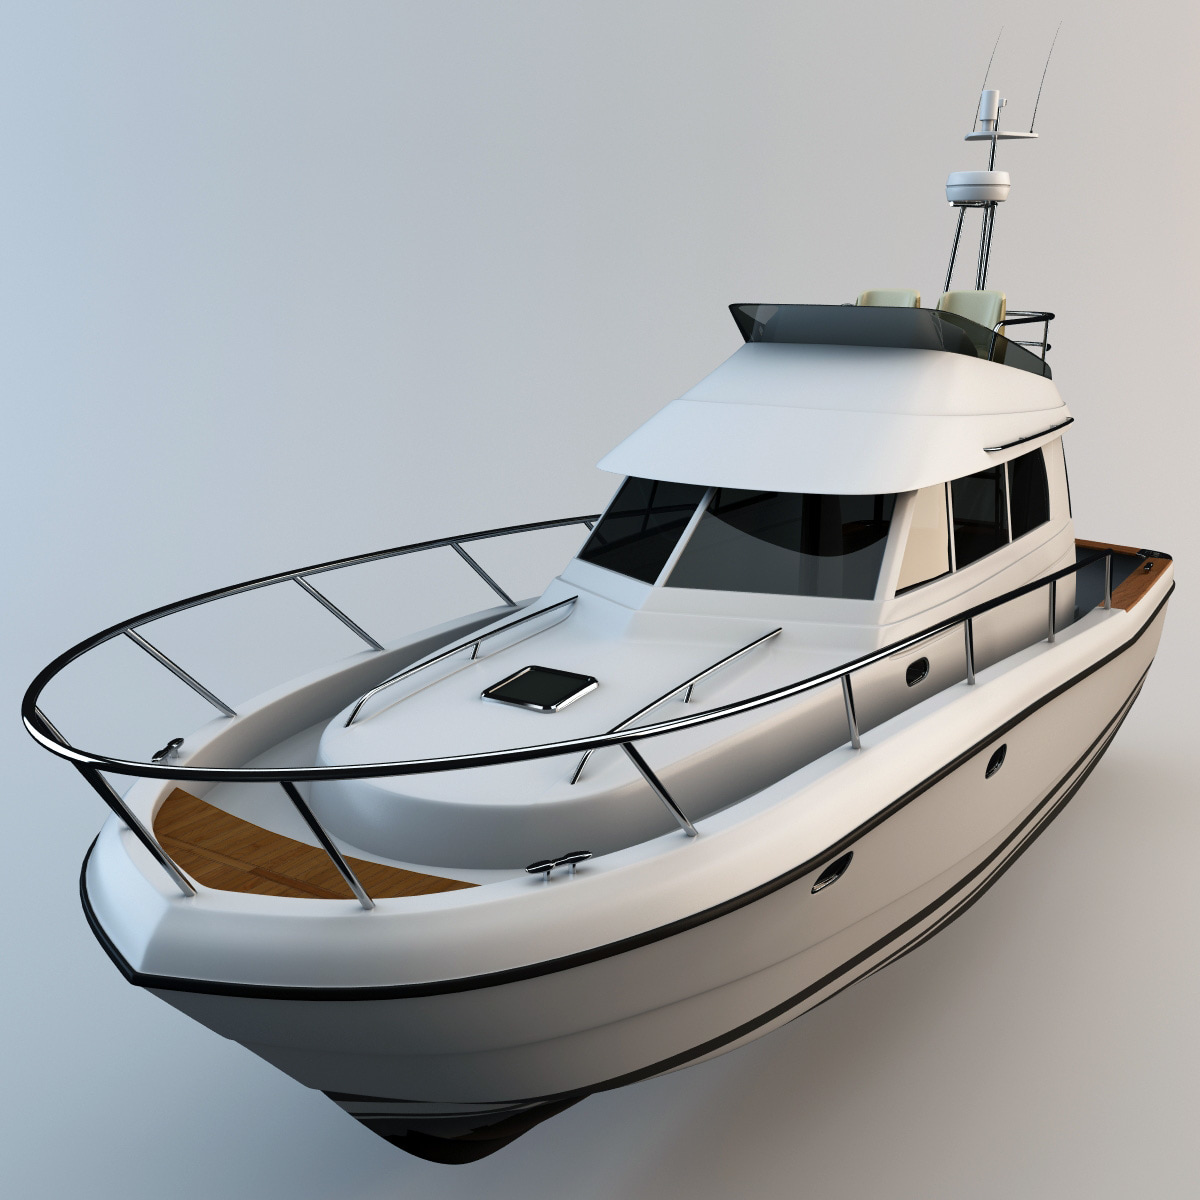 Motorboat_Yacht_Beneteau_Antares_1080_001.jpg